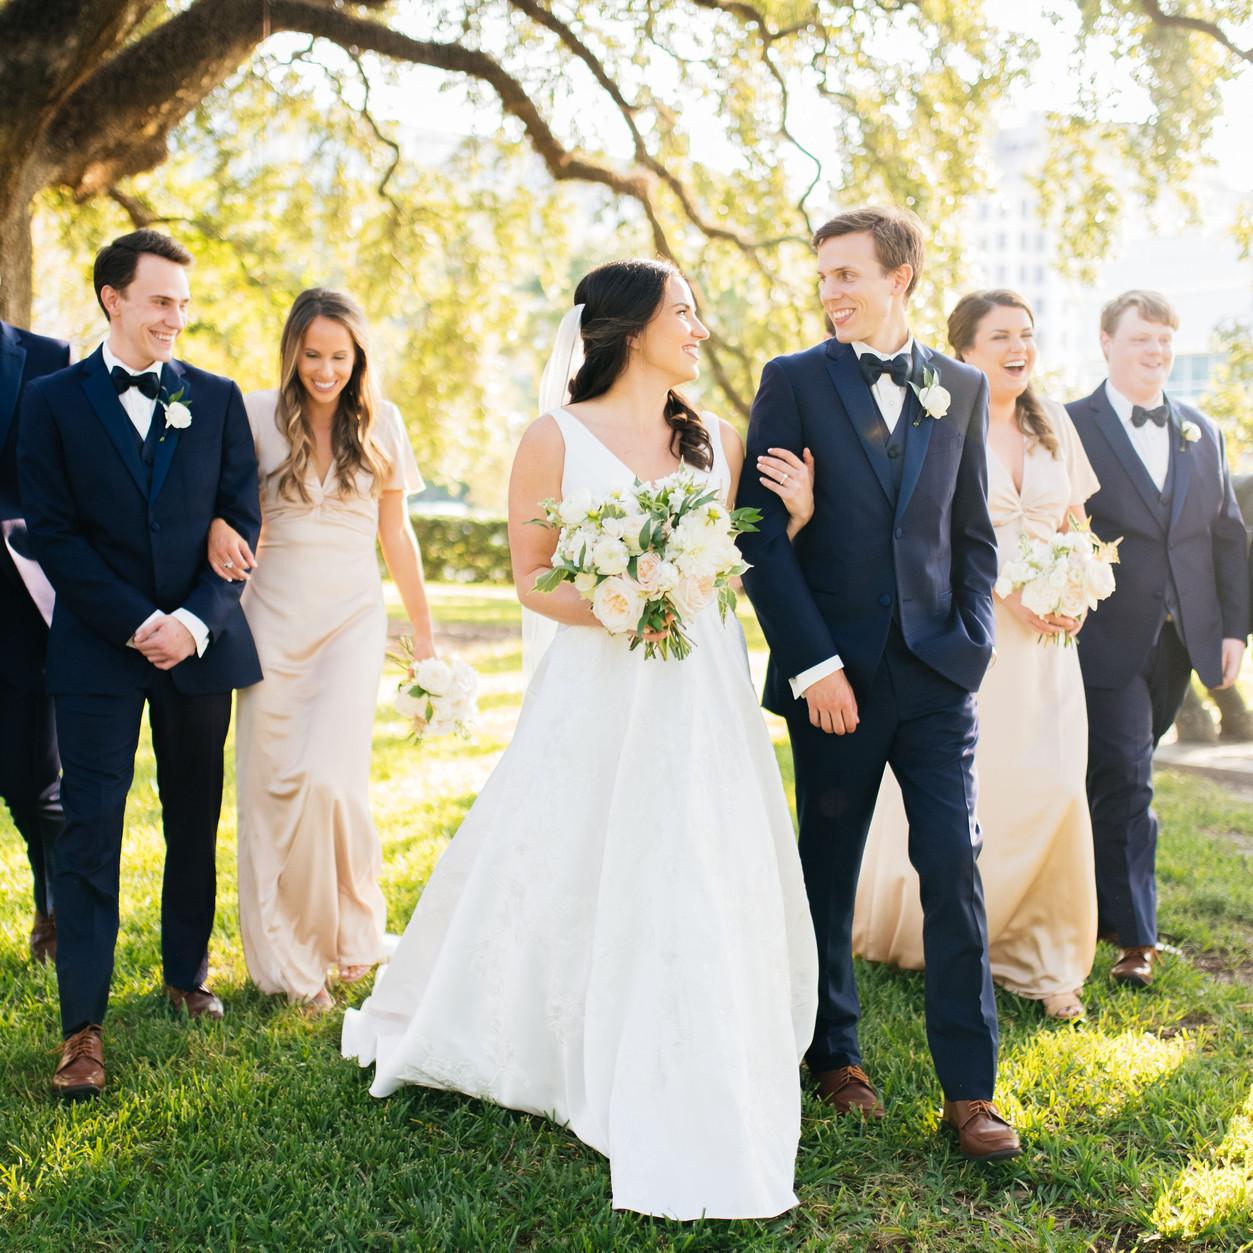 brouillette-formals-families-41.jpg